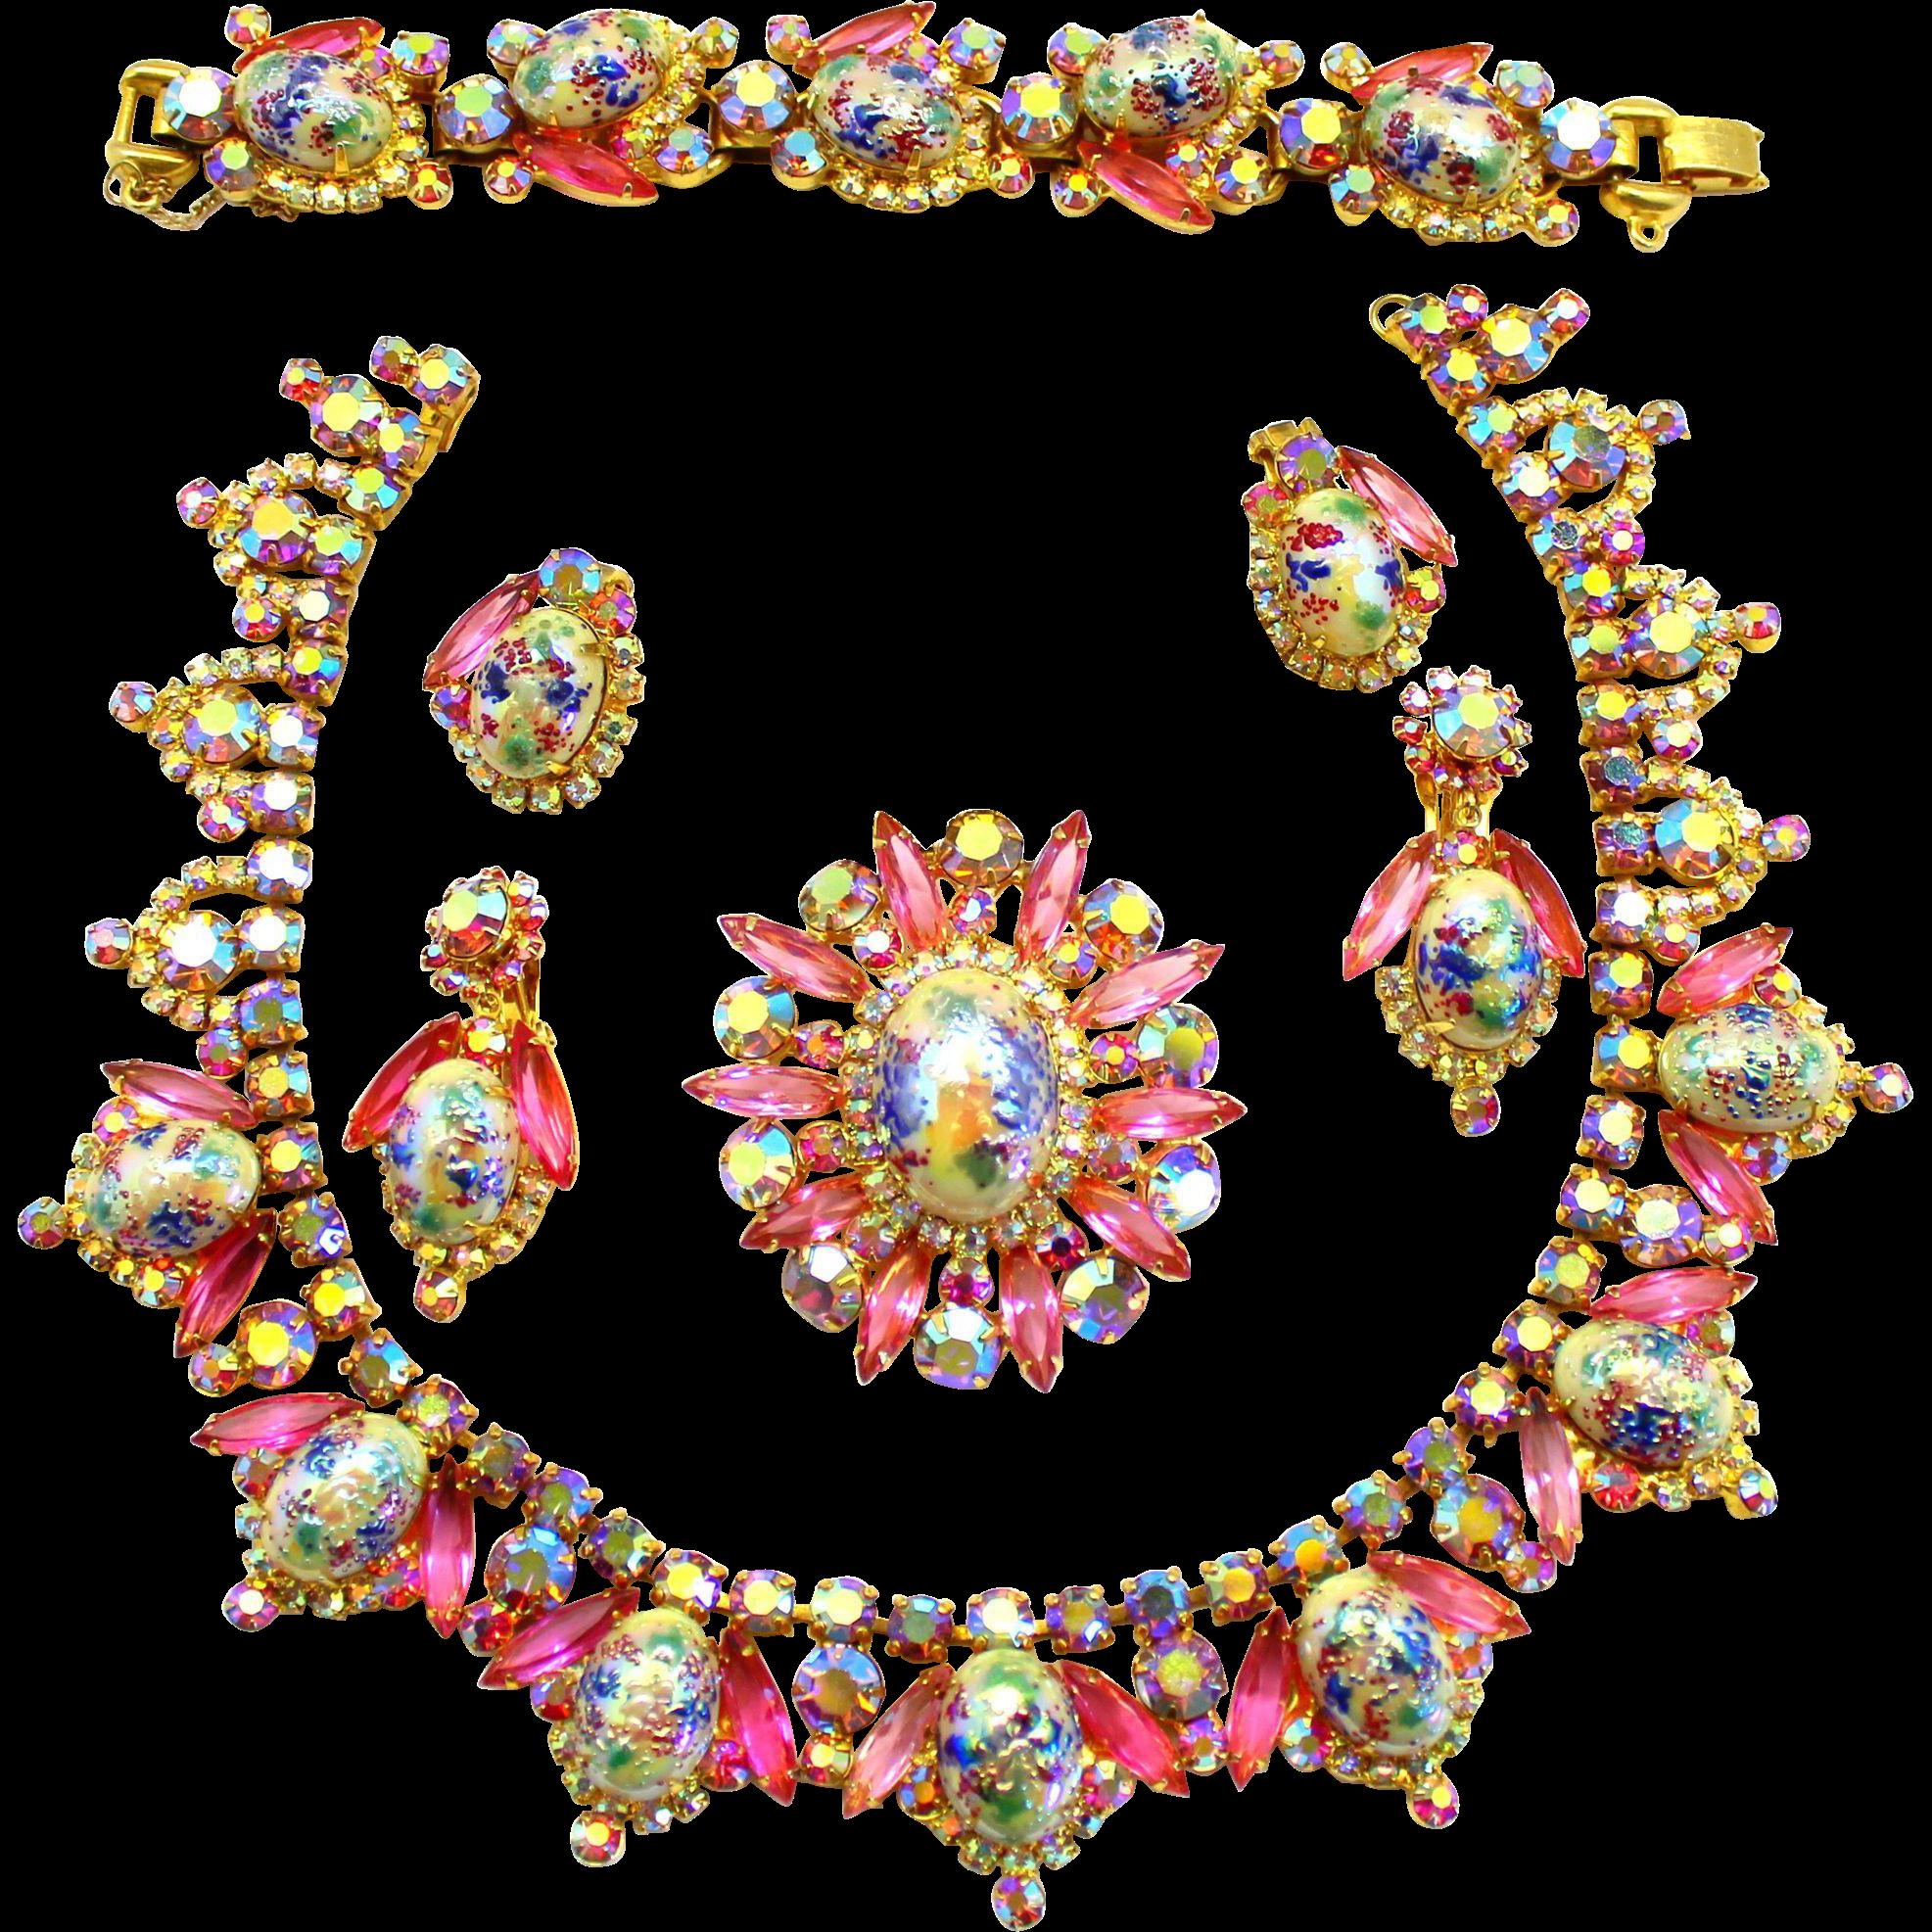 Vintage Juliana Book Piece Pink Rhinestone Stippled Cabochon Easter Egg Collar Necklace Bracelet Brooch Earrings Parure